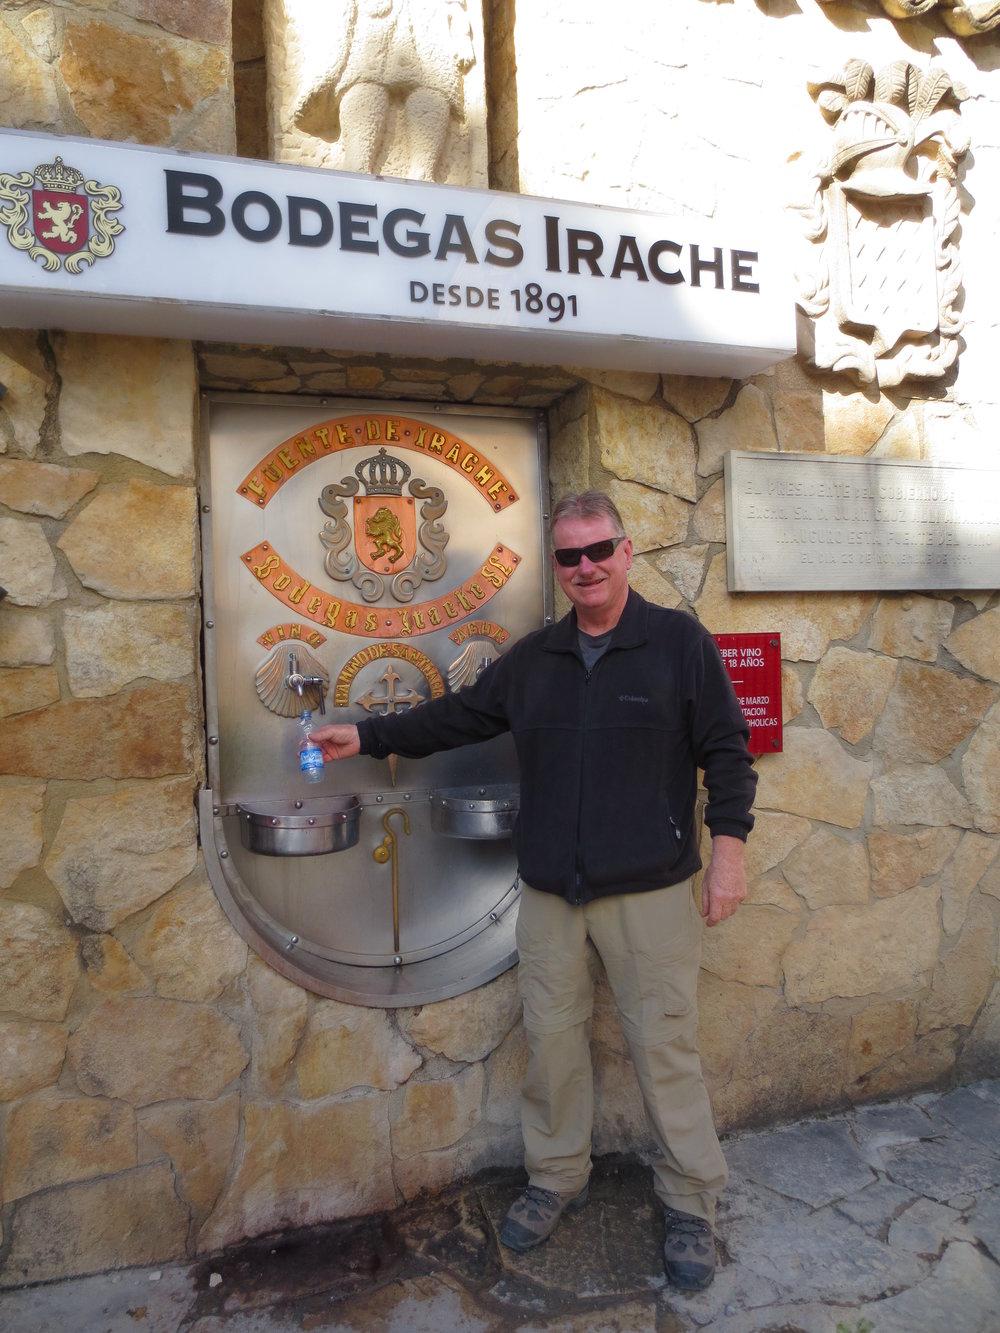 image 9, Bodegas Irache.JPG